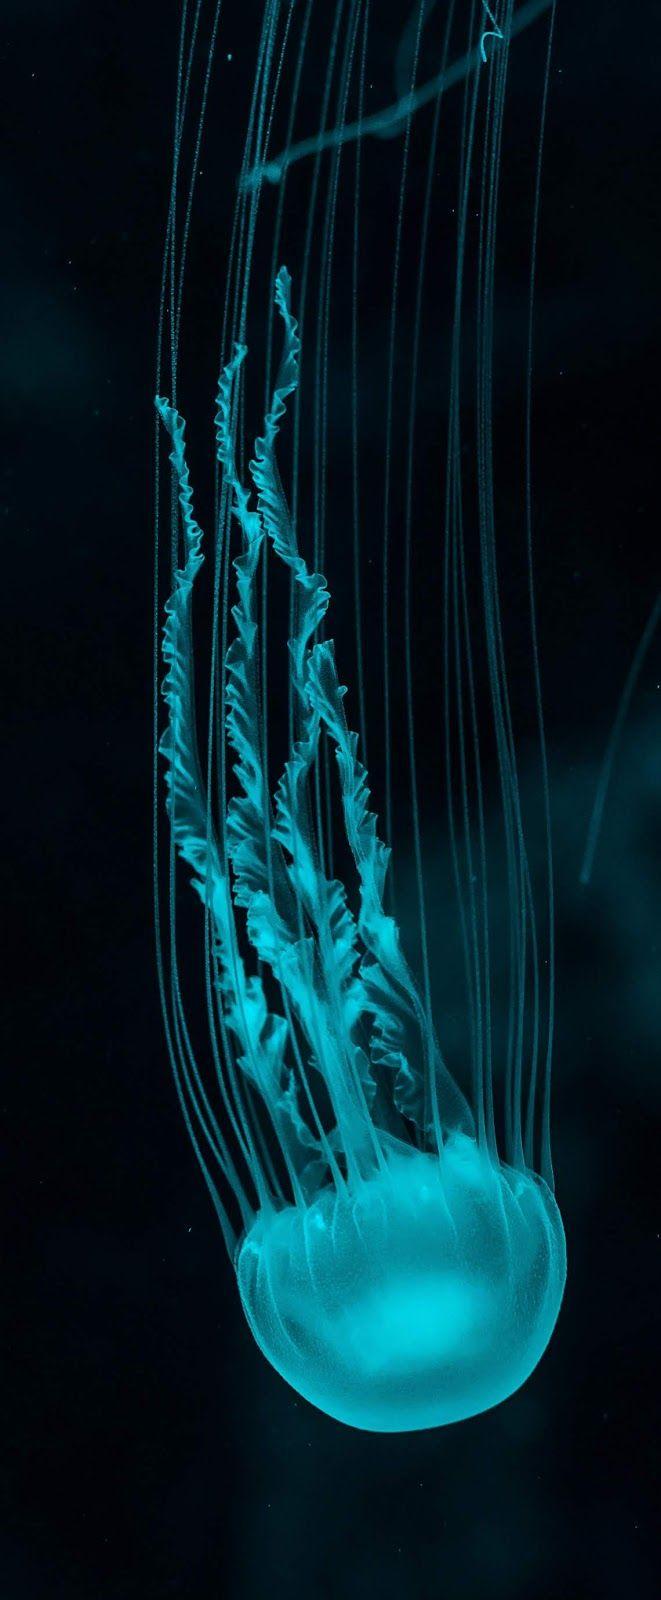 A marvelous jellyfish. #Sea #Ocean #OceanLife #Animals #JellyFish